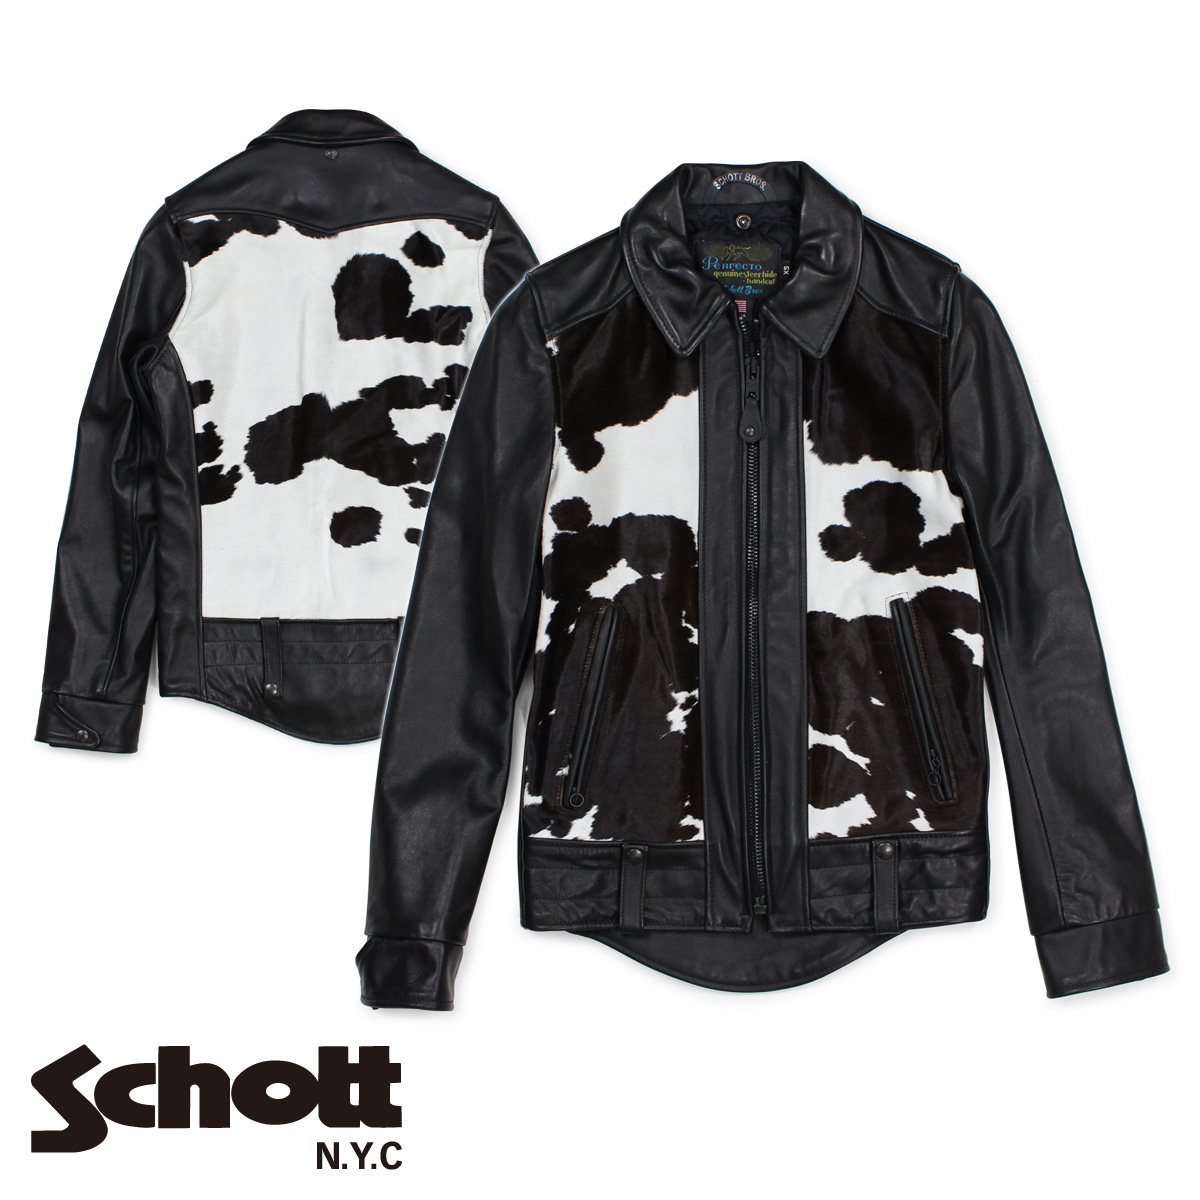 Schott ショット ライダースジャケット ジャケット レザージャケット メンズ EL CAMINO 50S WEST COAST BIKER JACKET ブラック 黒 P6422